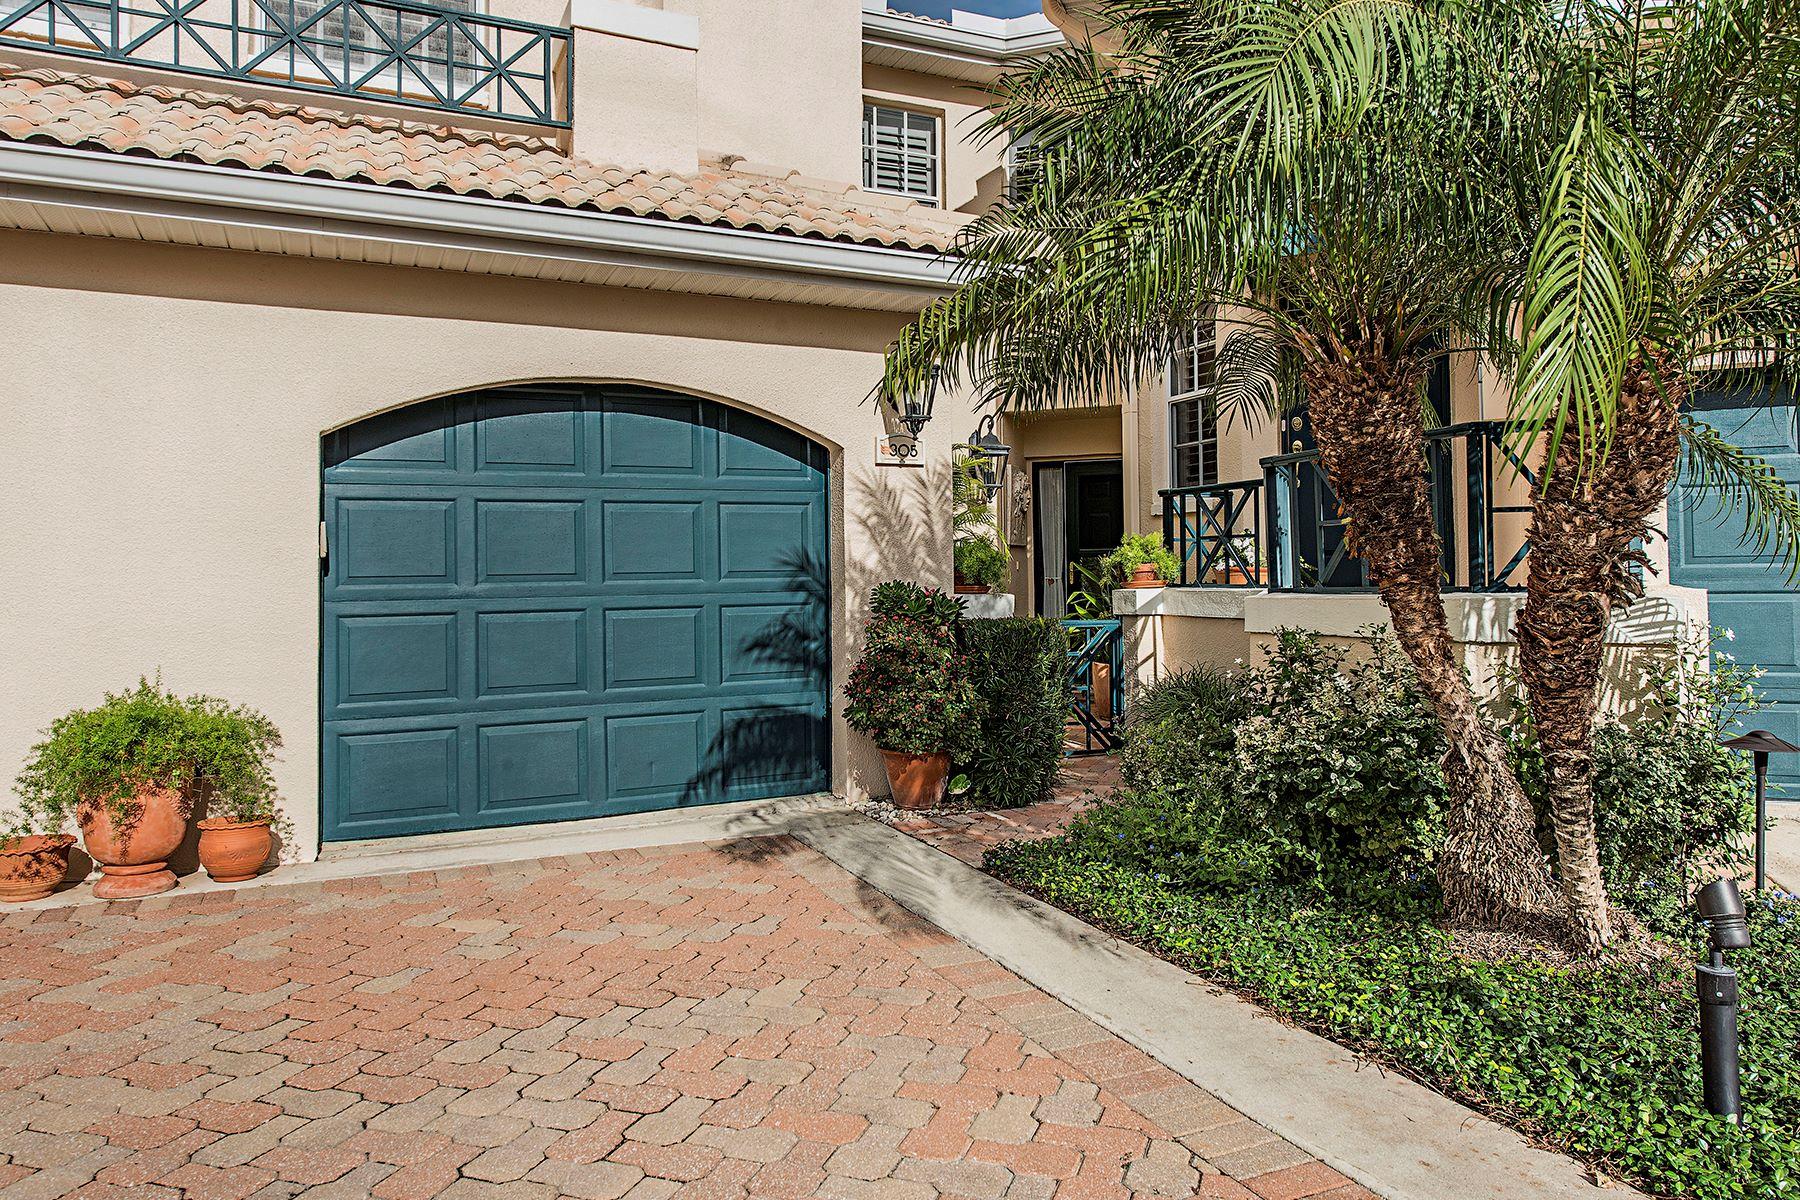 Additional photo for property listing at PELICAN BAY - SAN MARINO 6865  San Marino Dr 305C,  Naples, Florida 34108 United States